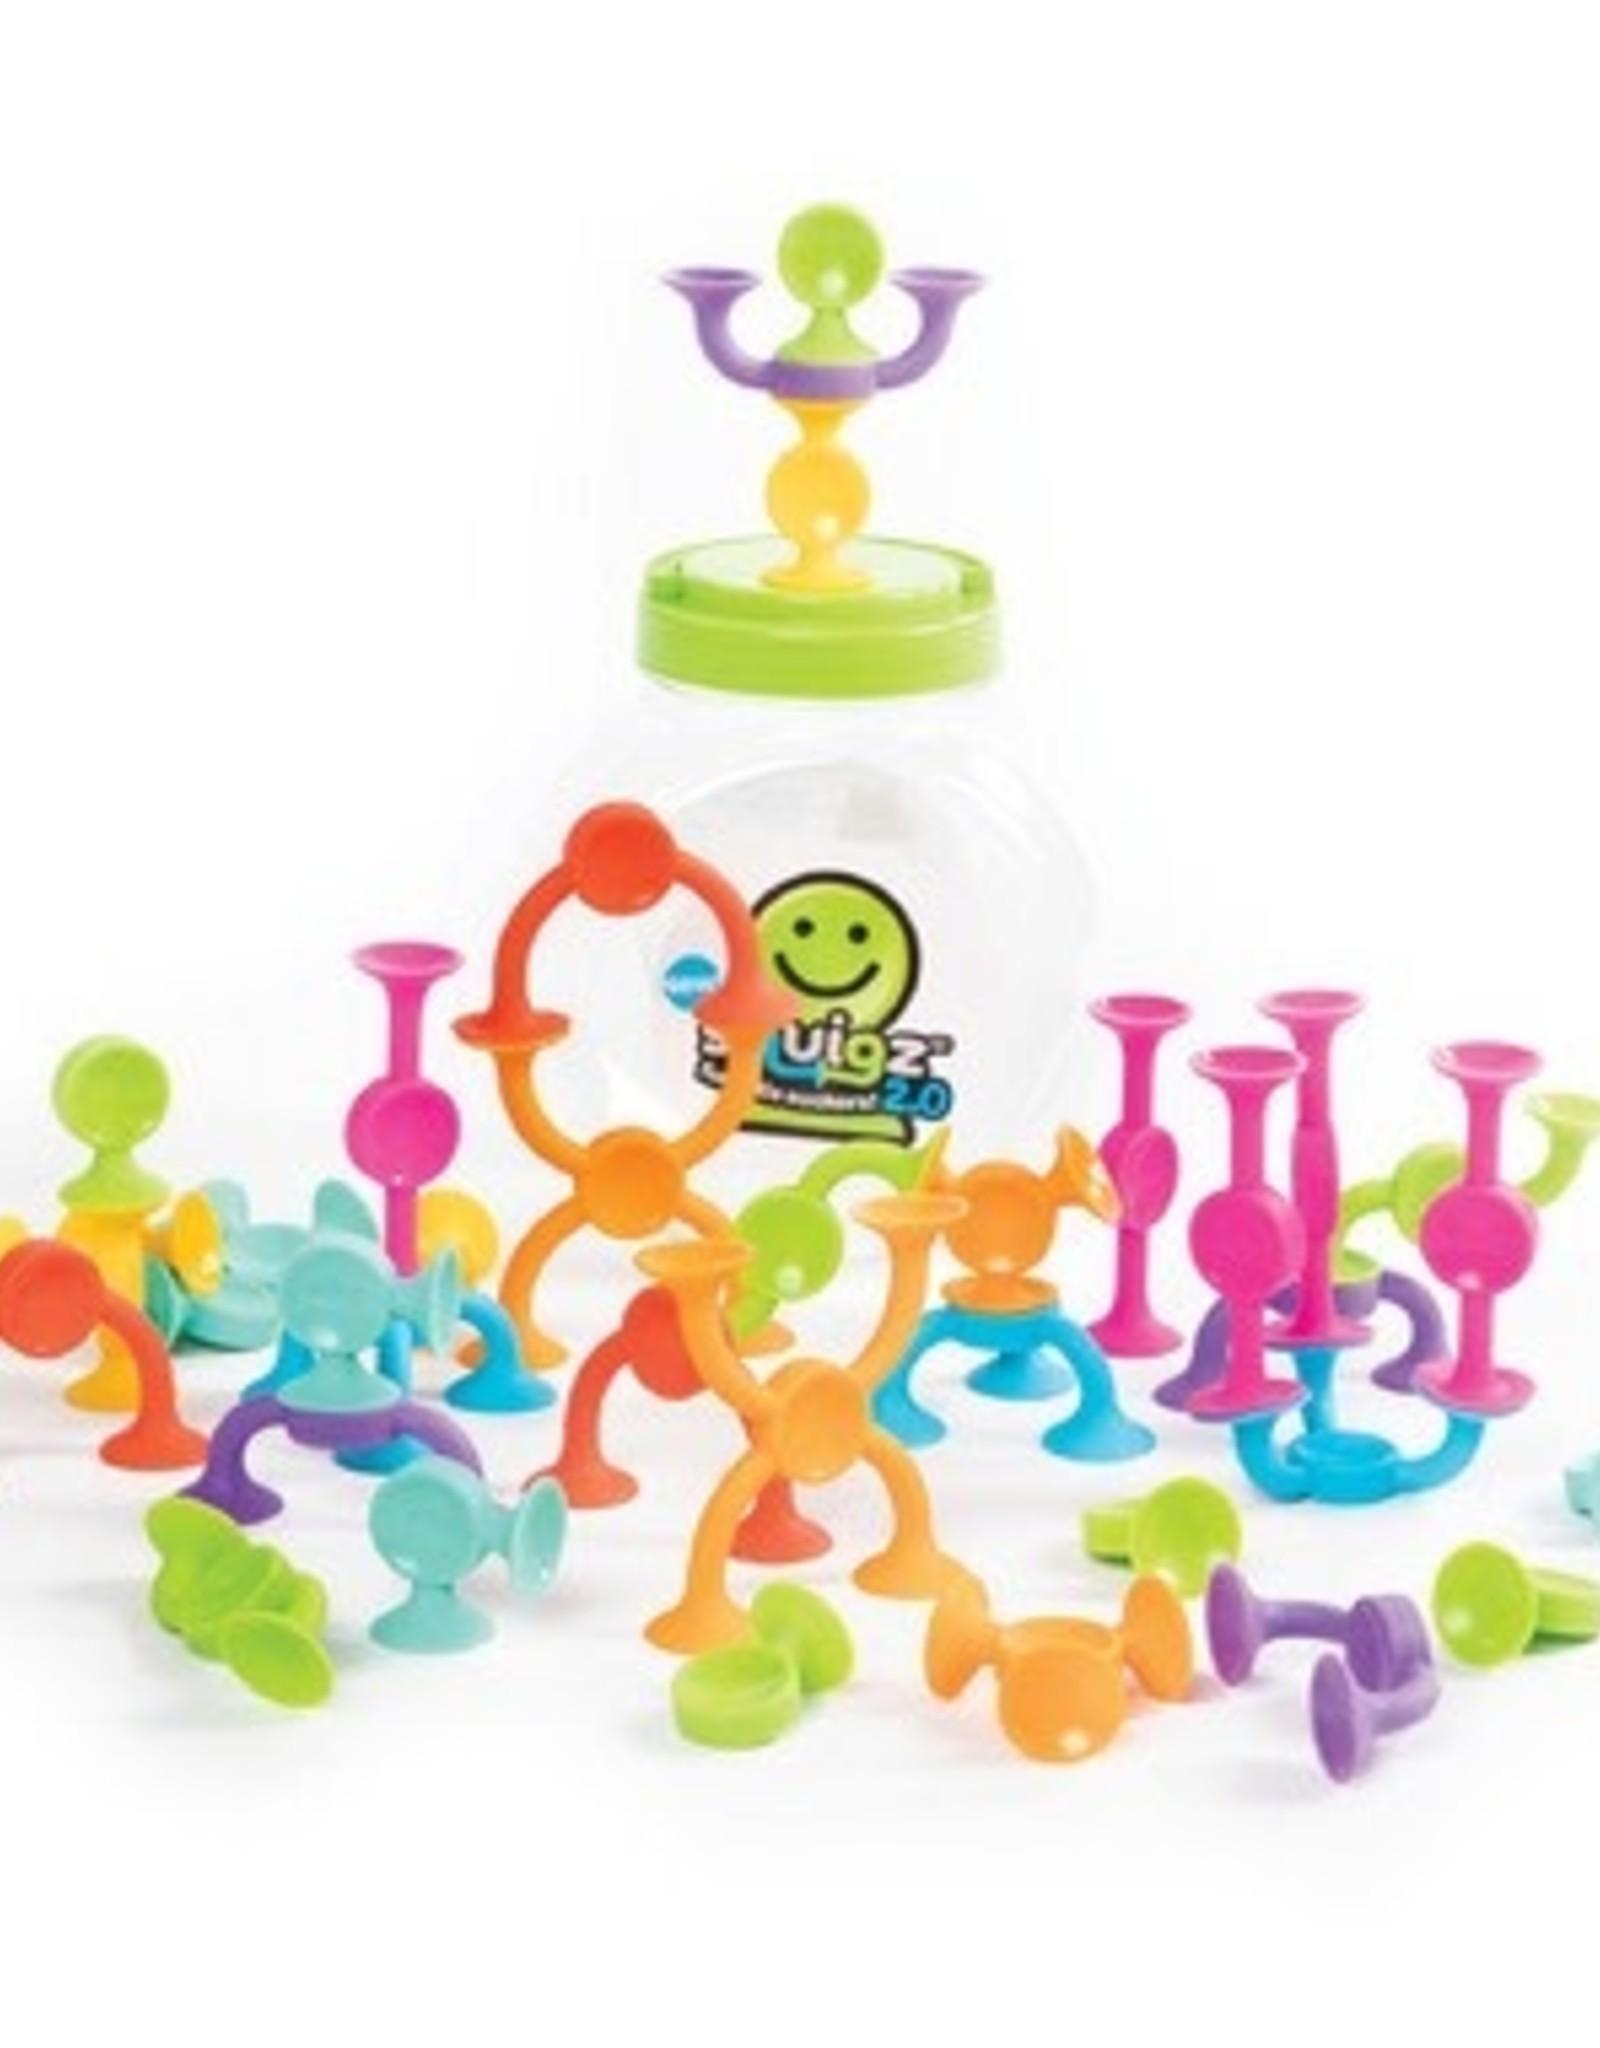 Fat Brain Toy Co. Squigz 2.0